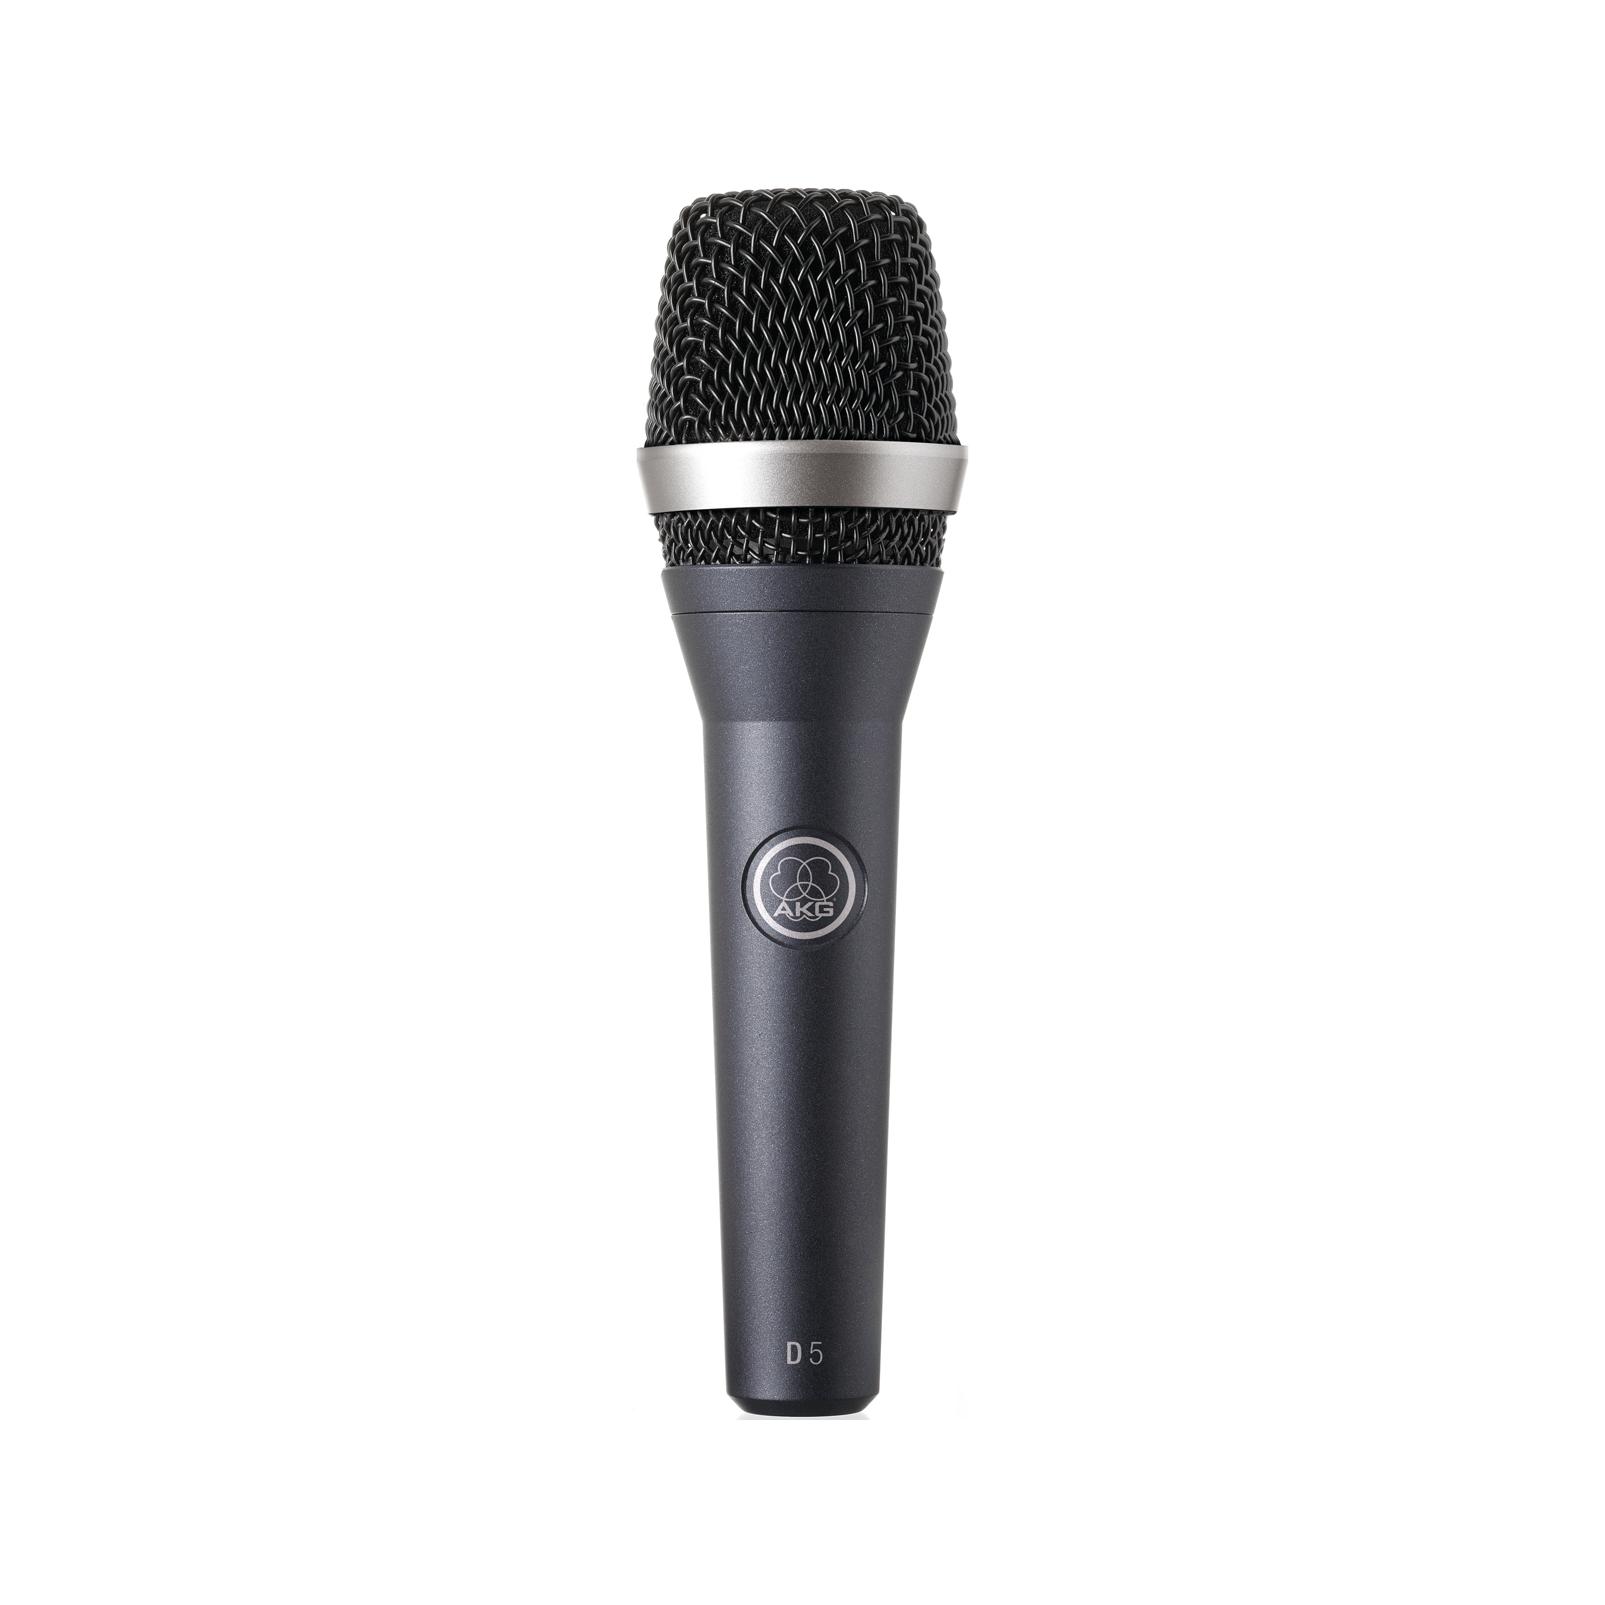 D5 - Dark Blue - Professional dynamic supercardioid vocal microphone - Hero